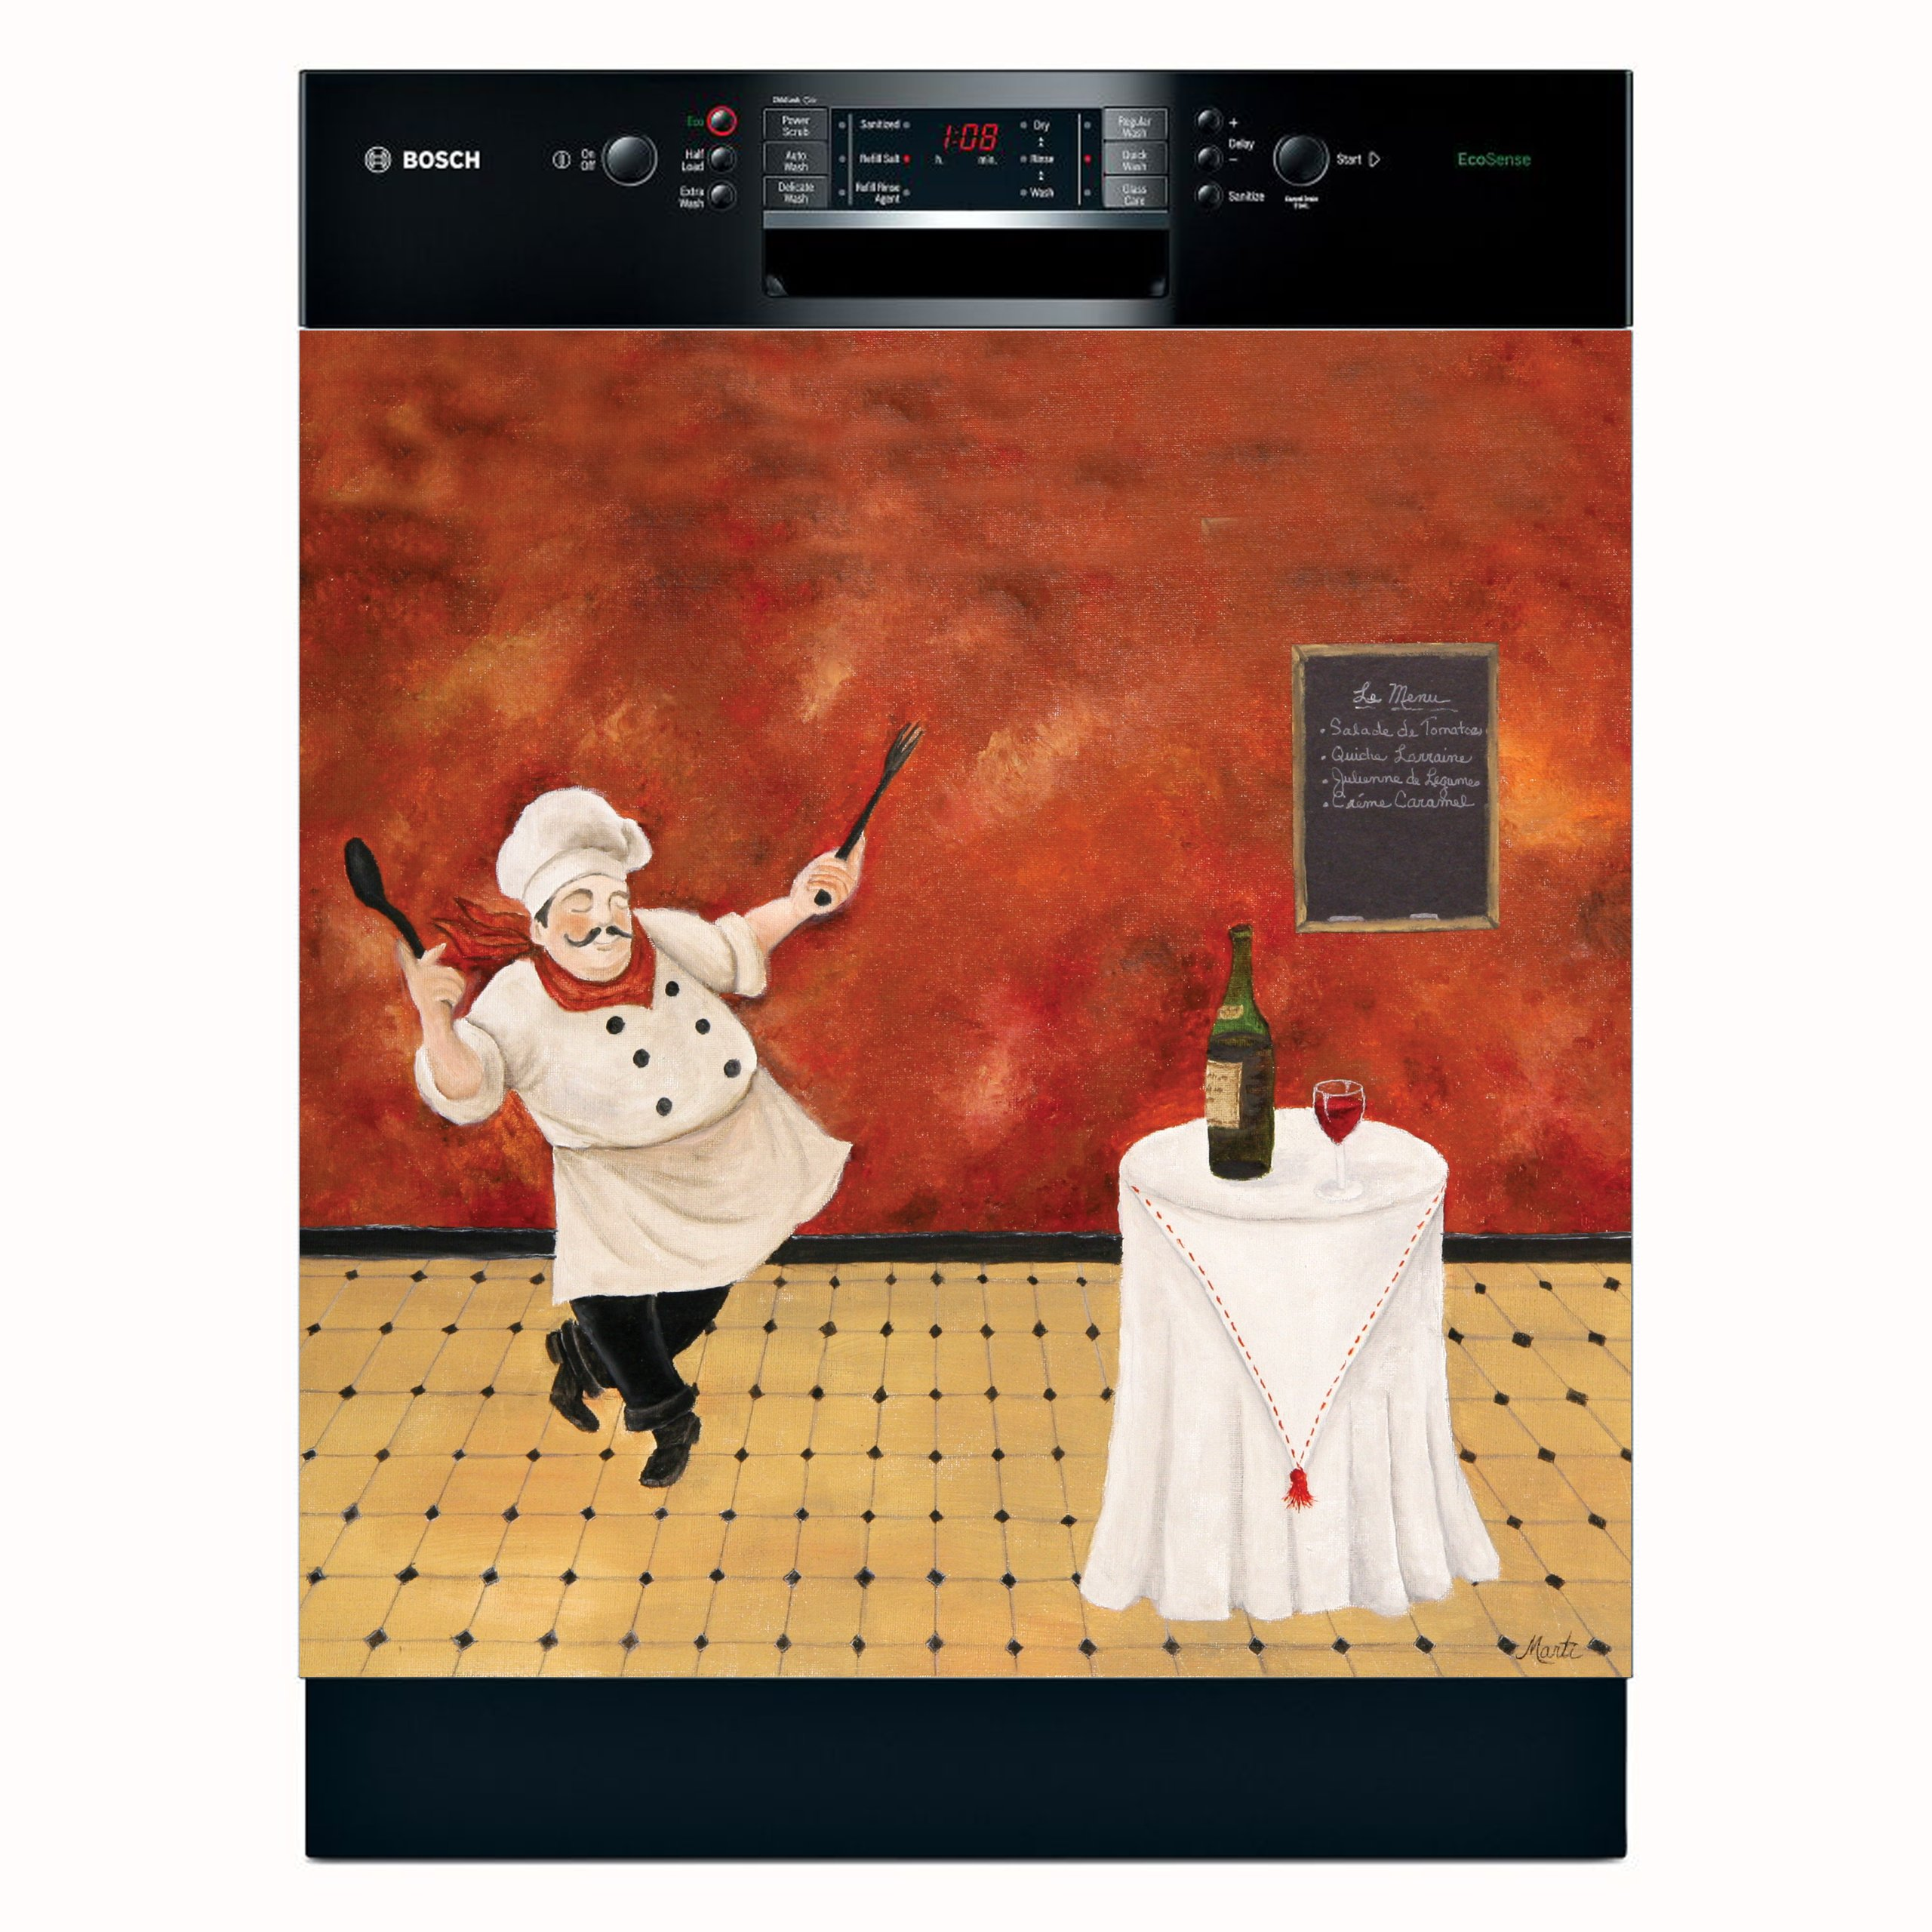 Appliance Art Dishwasher Large - Magnet by Appliance Art